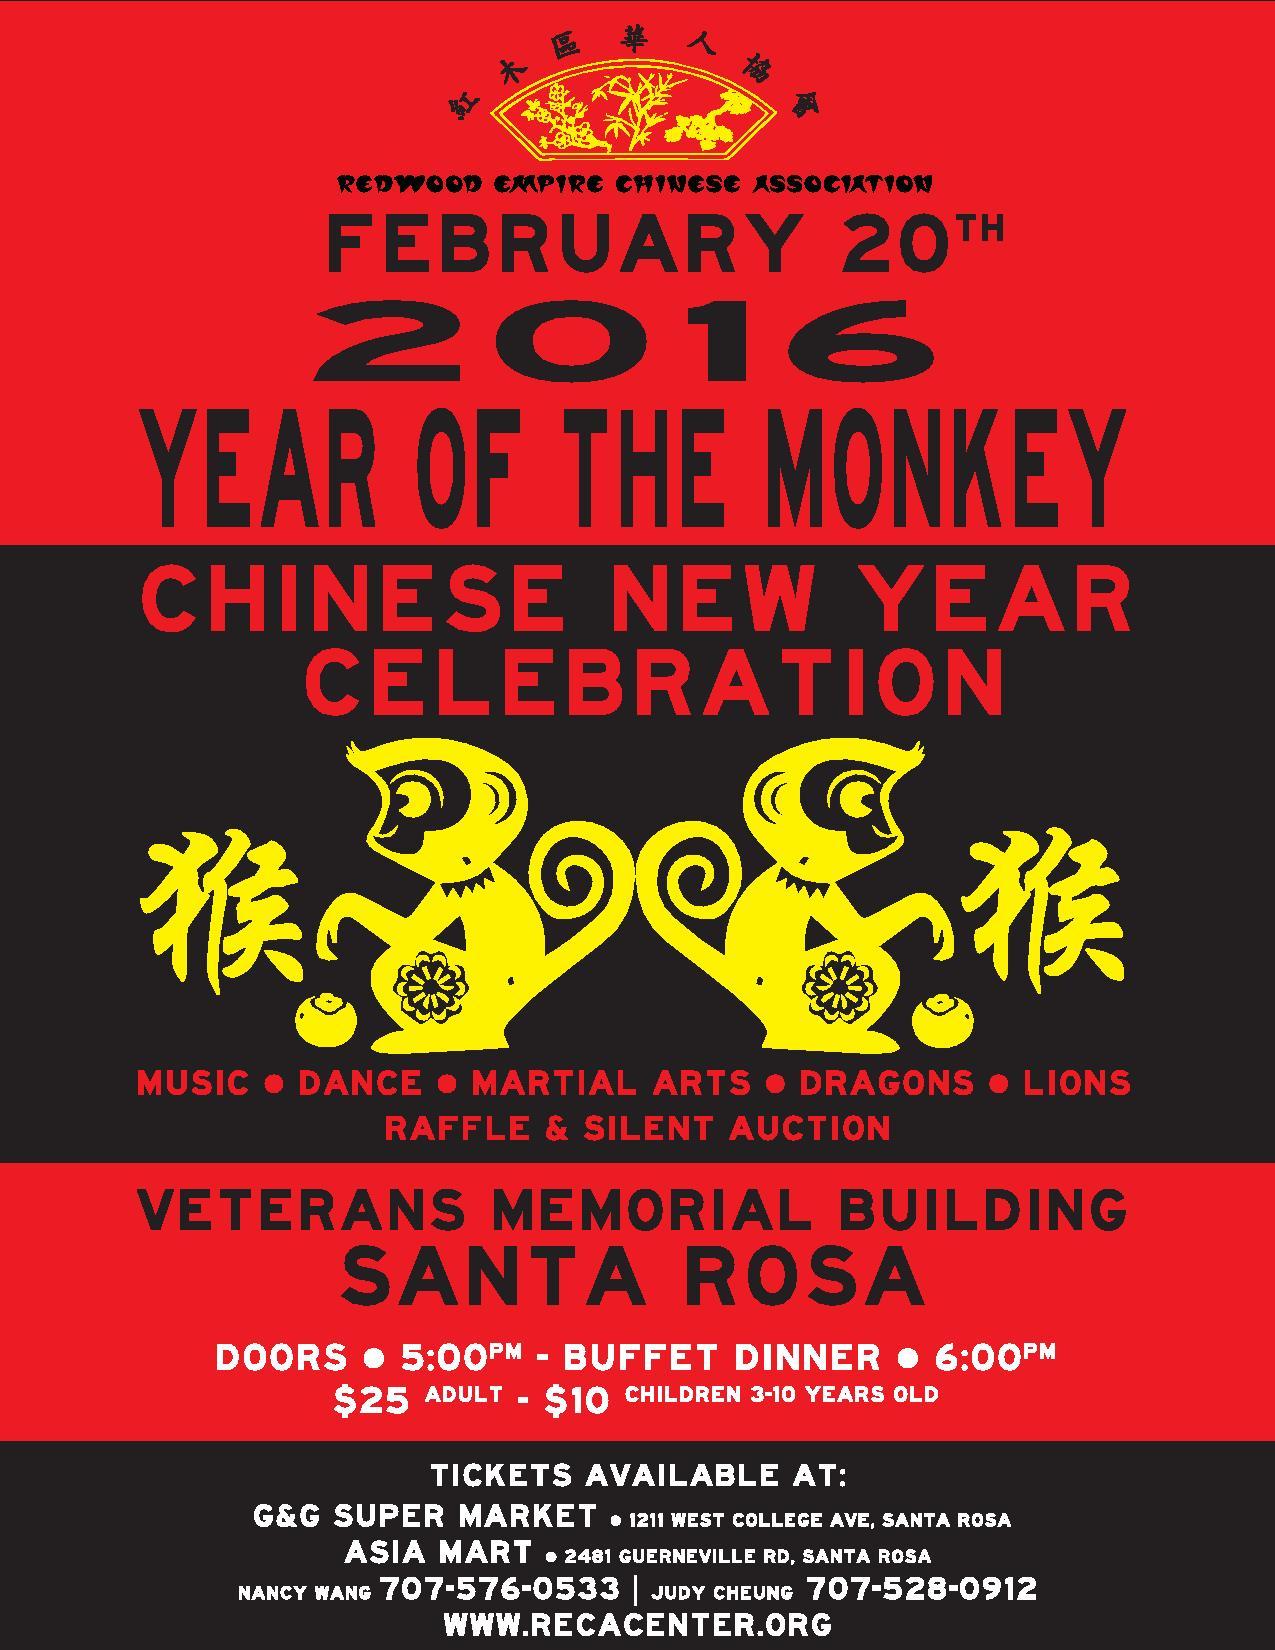 2/20/2016 Year of the Monkey Celebration poster